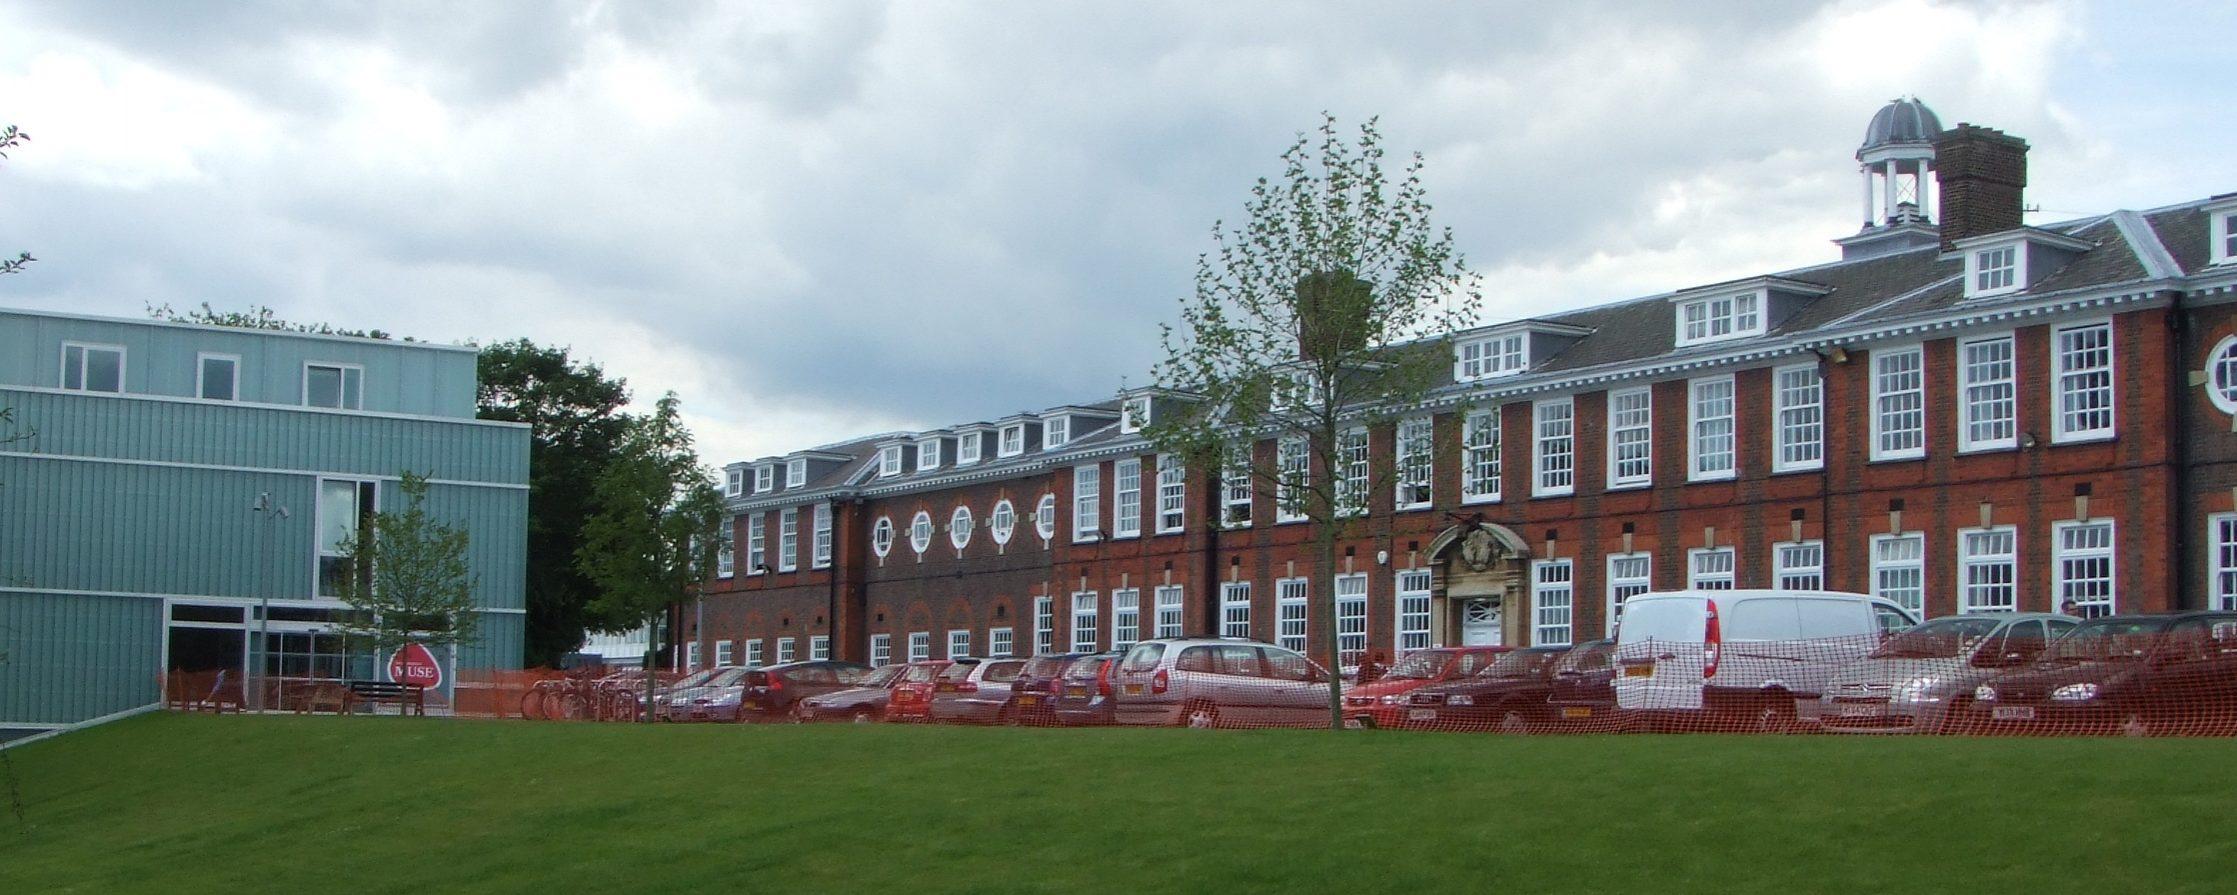 JOB | Teacher of Classics and Latin, Watford Grammar School for Boys